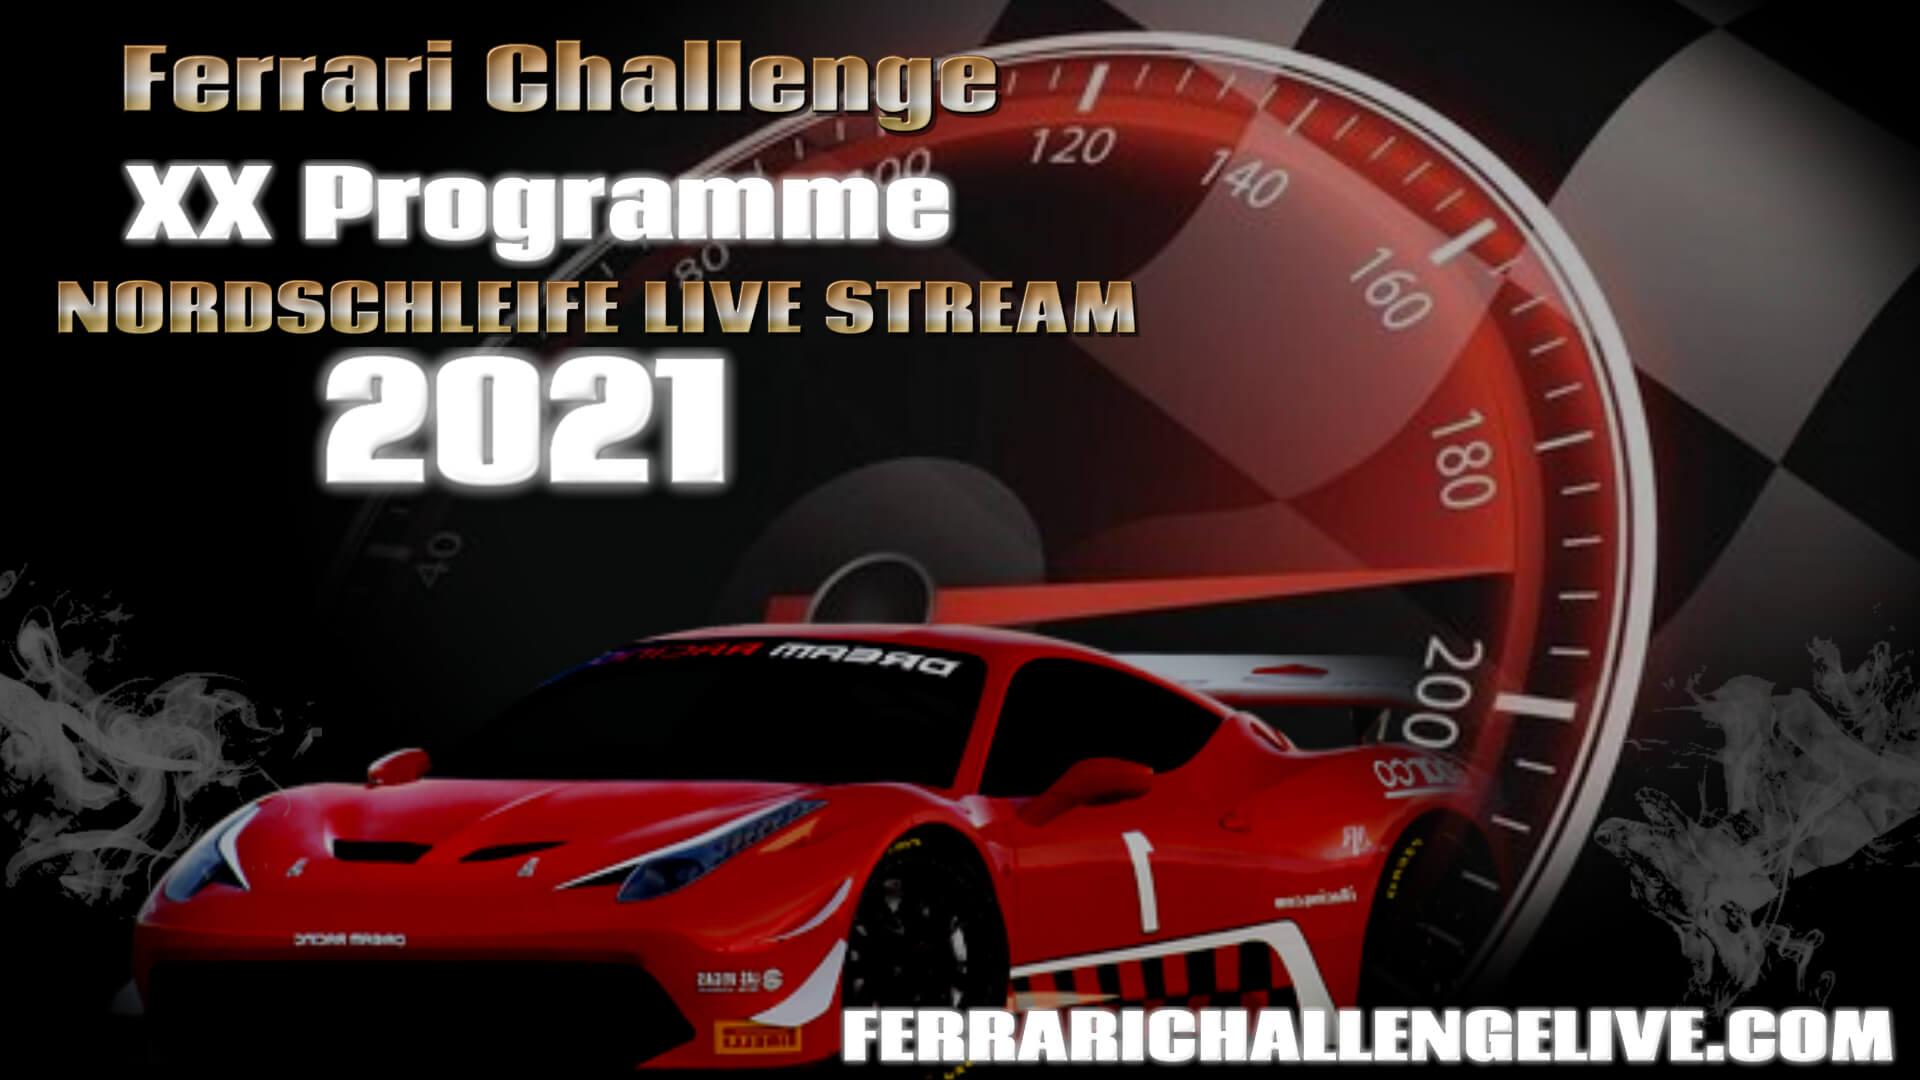 Nordschleife Live Stream 2021 | Ferrari Challenge XX Programme